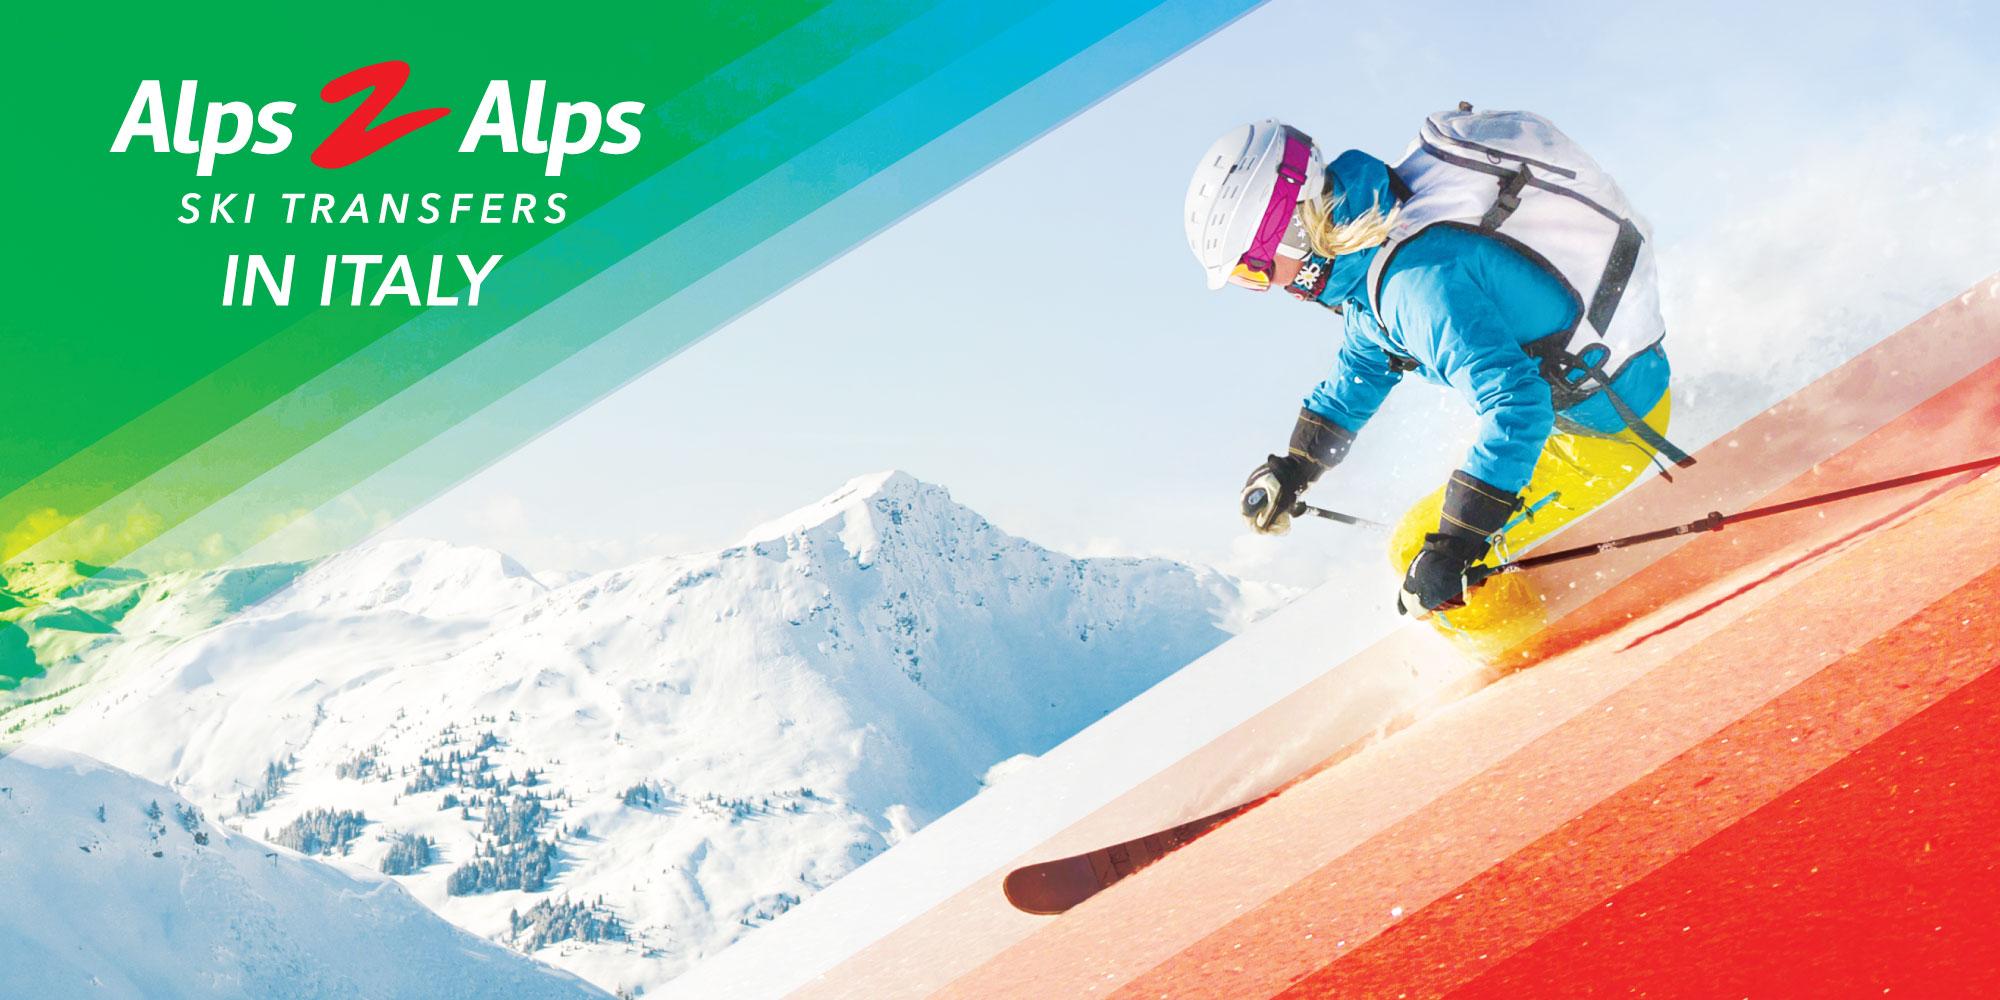 ski transfers to italy from alps 2 alps